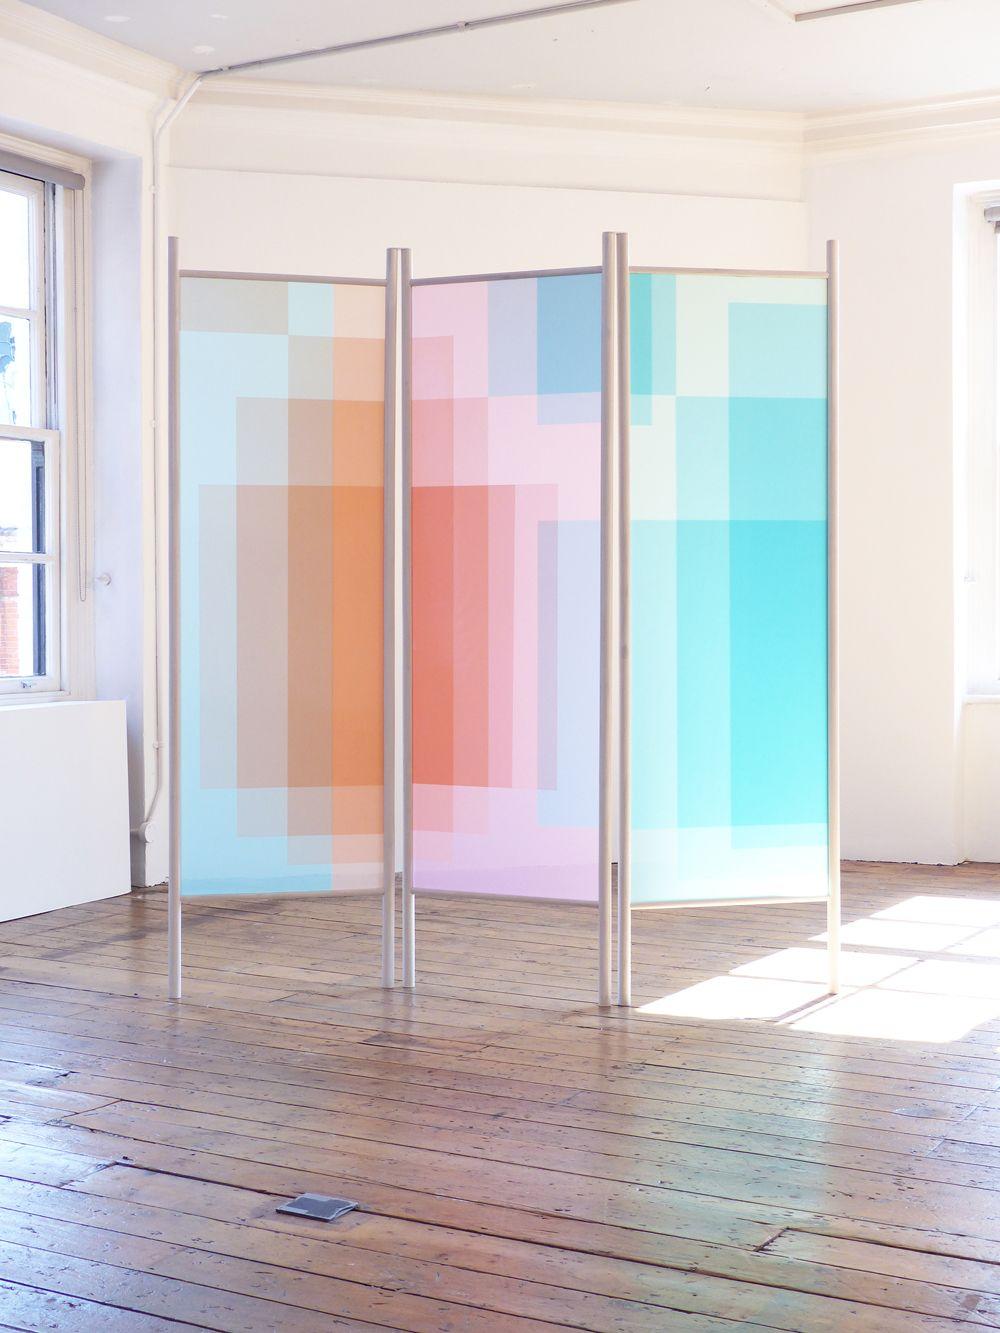 Future stars at the aram galleryldf furniturecontemporary